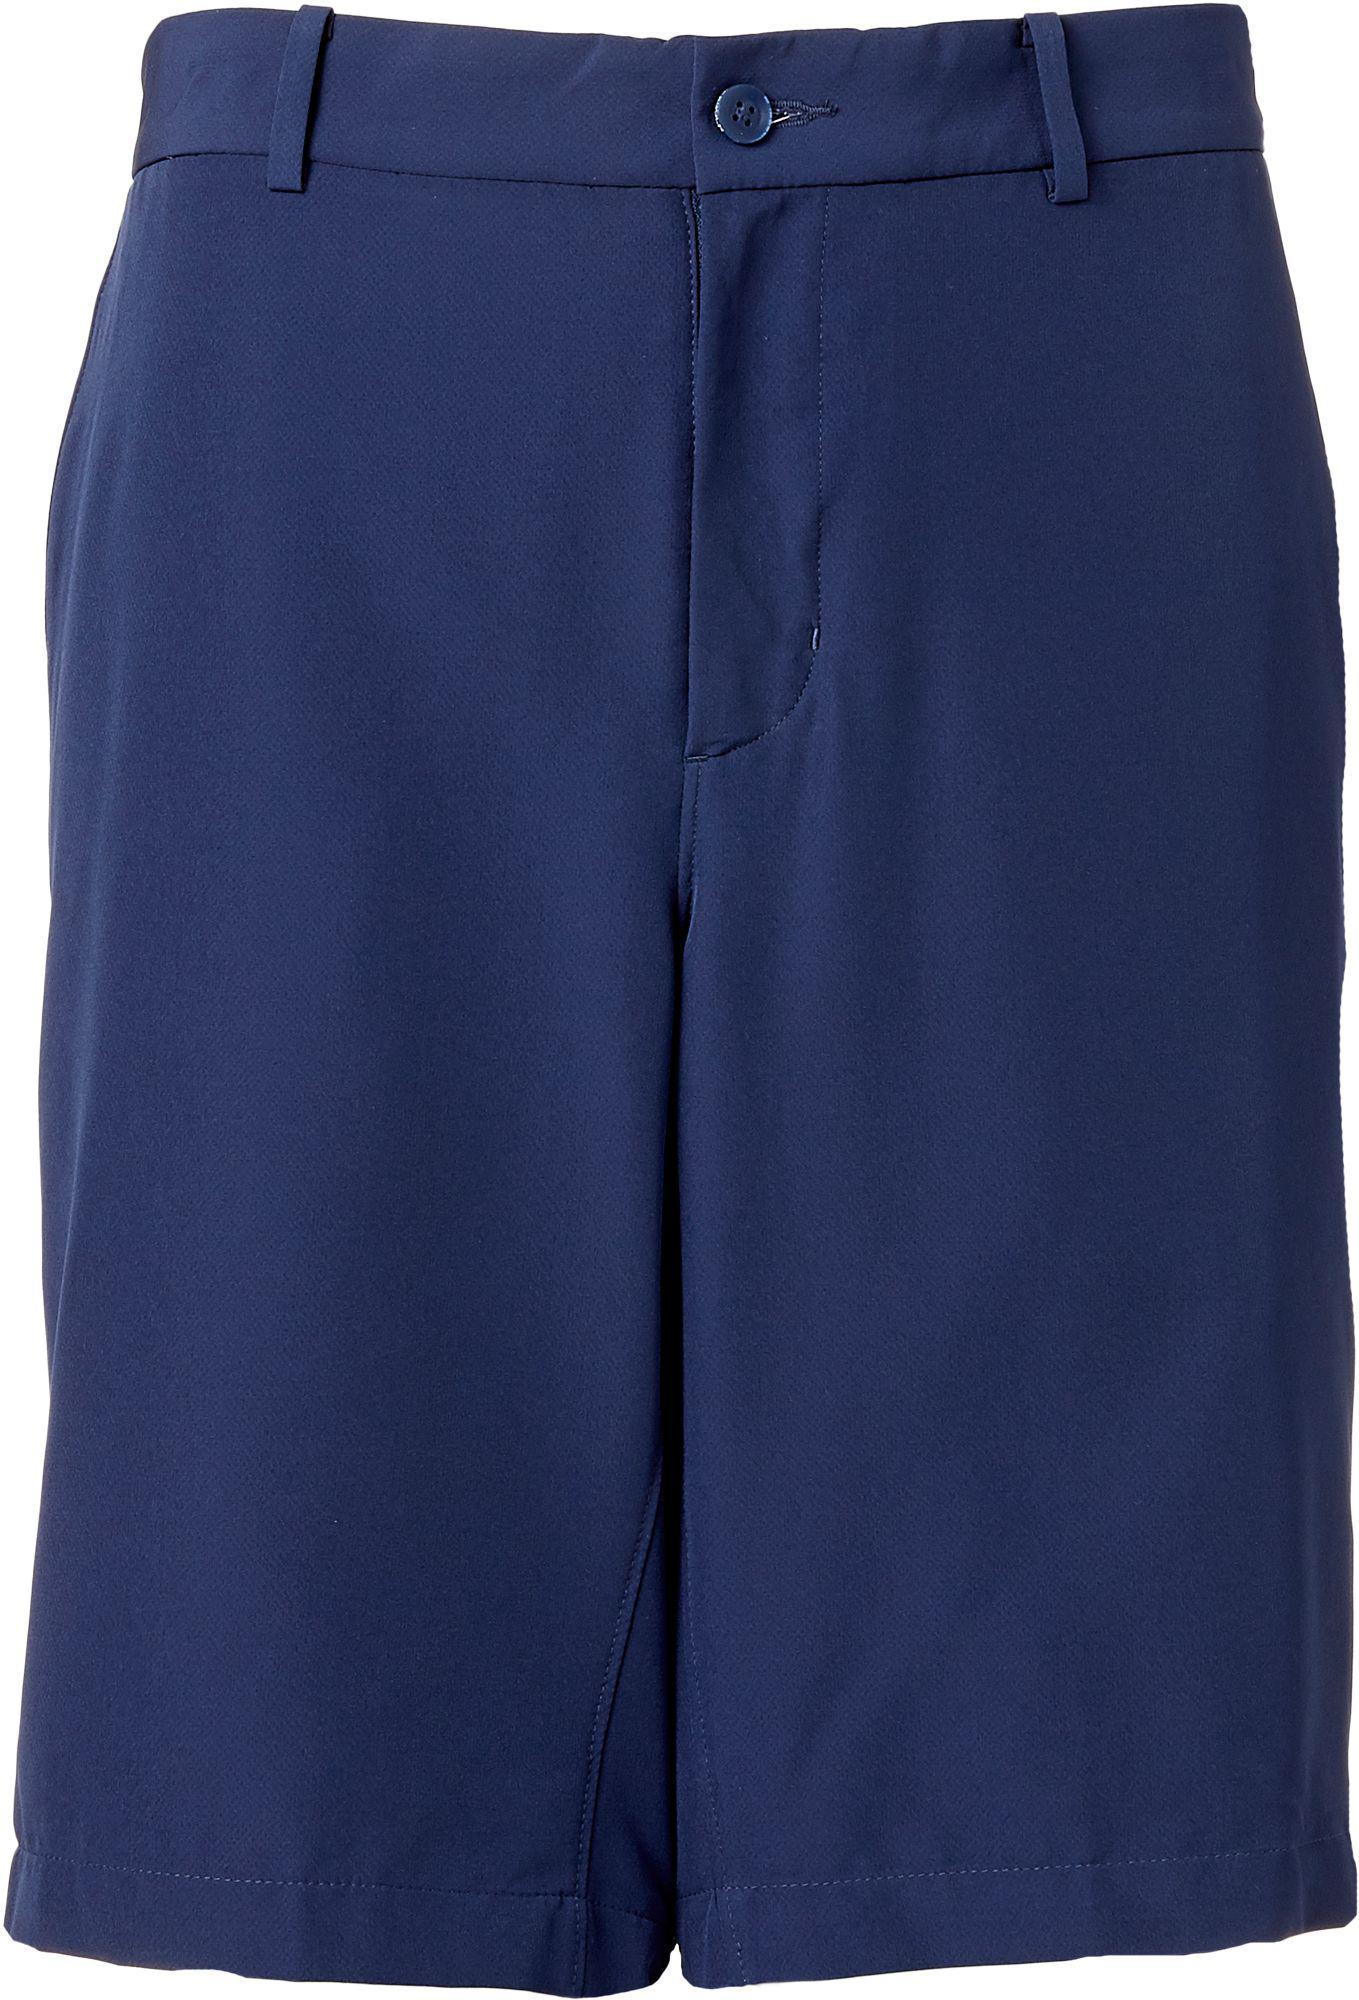 6510455eeafd Lyst - Nike Hybrid Woven Golf Shorts in Blue for Men